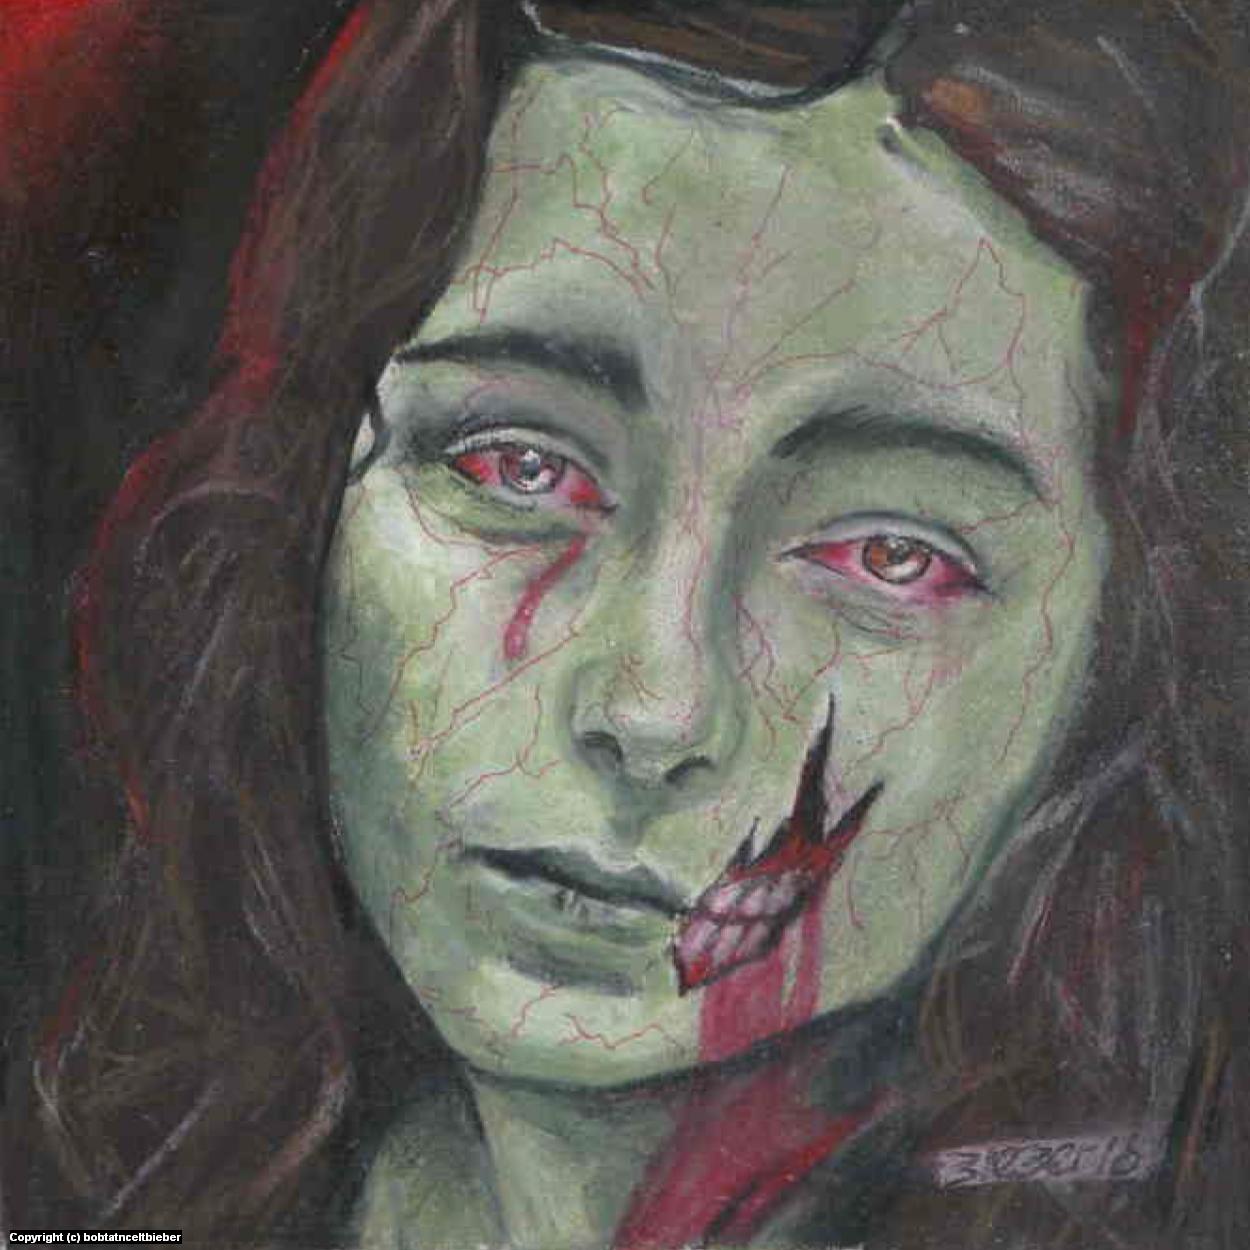 The Dead Girl Artwork by Bob Bieber